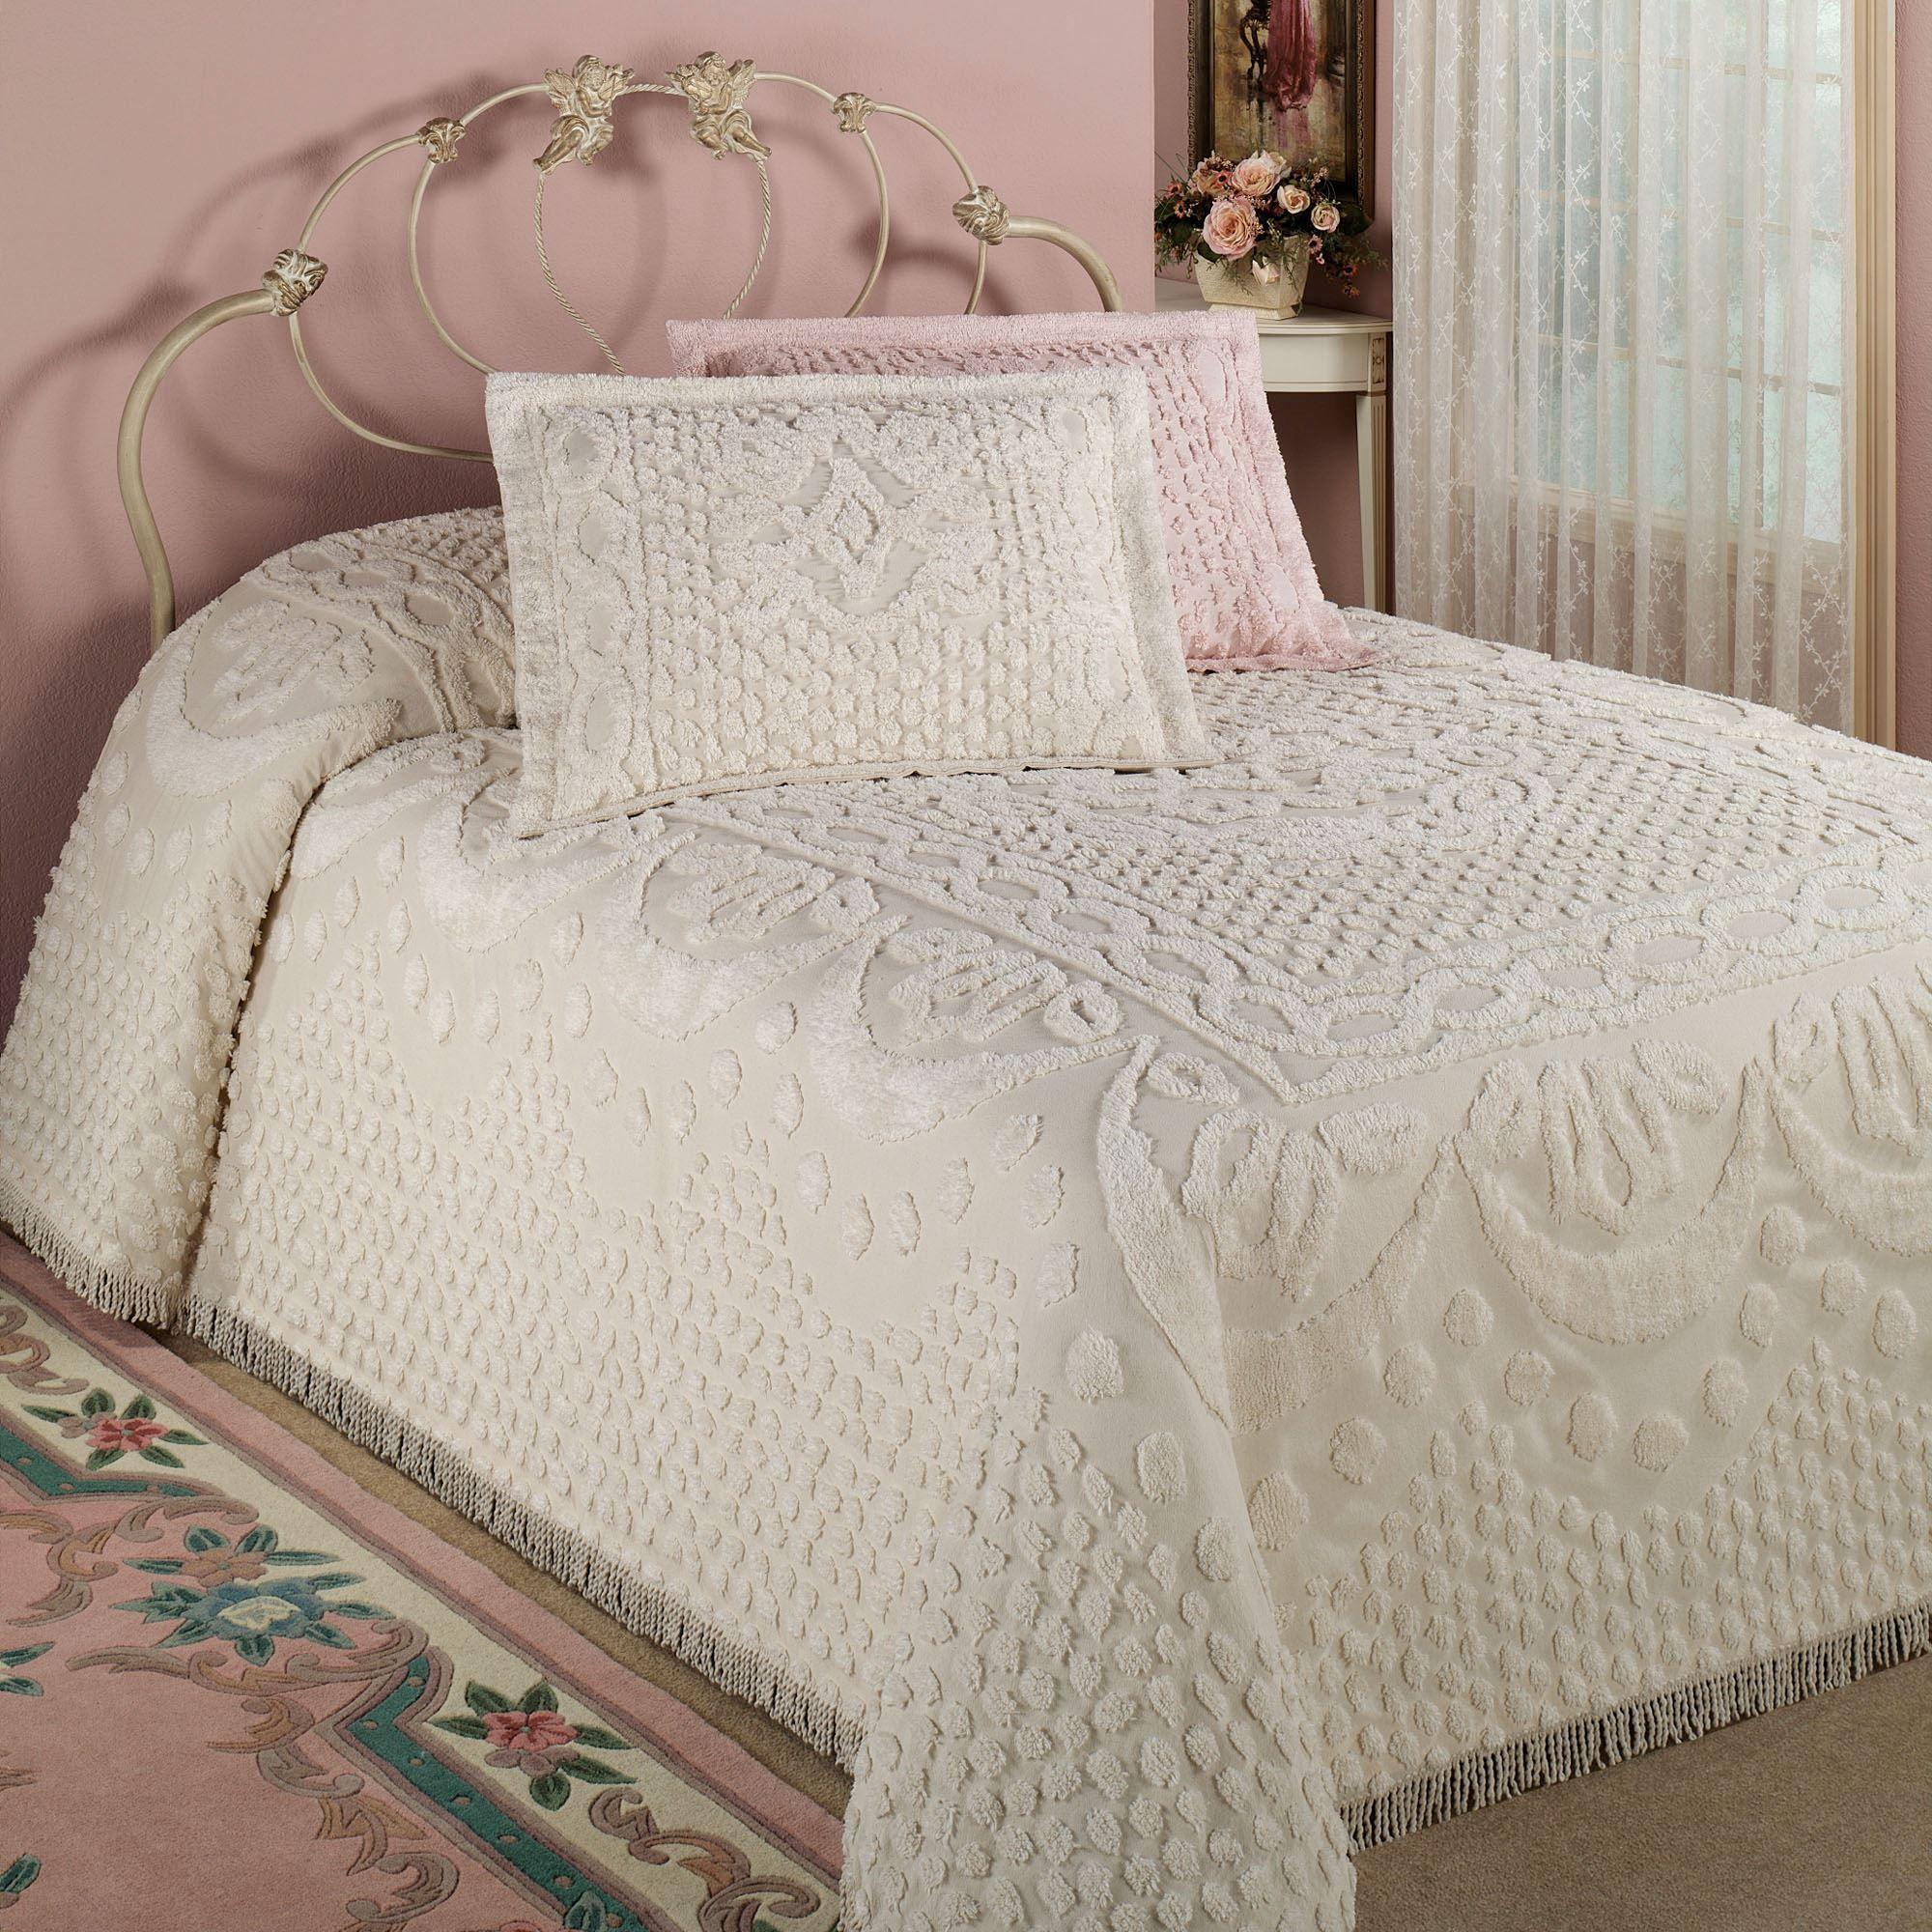 Kingston Beige Or White Chenille Bedspreads Chenille Bedspread